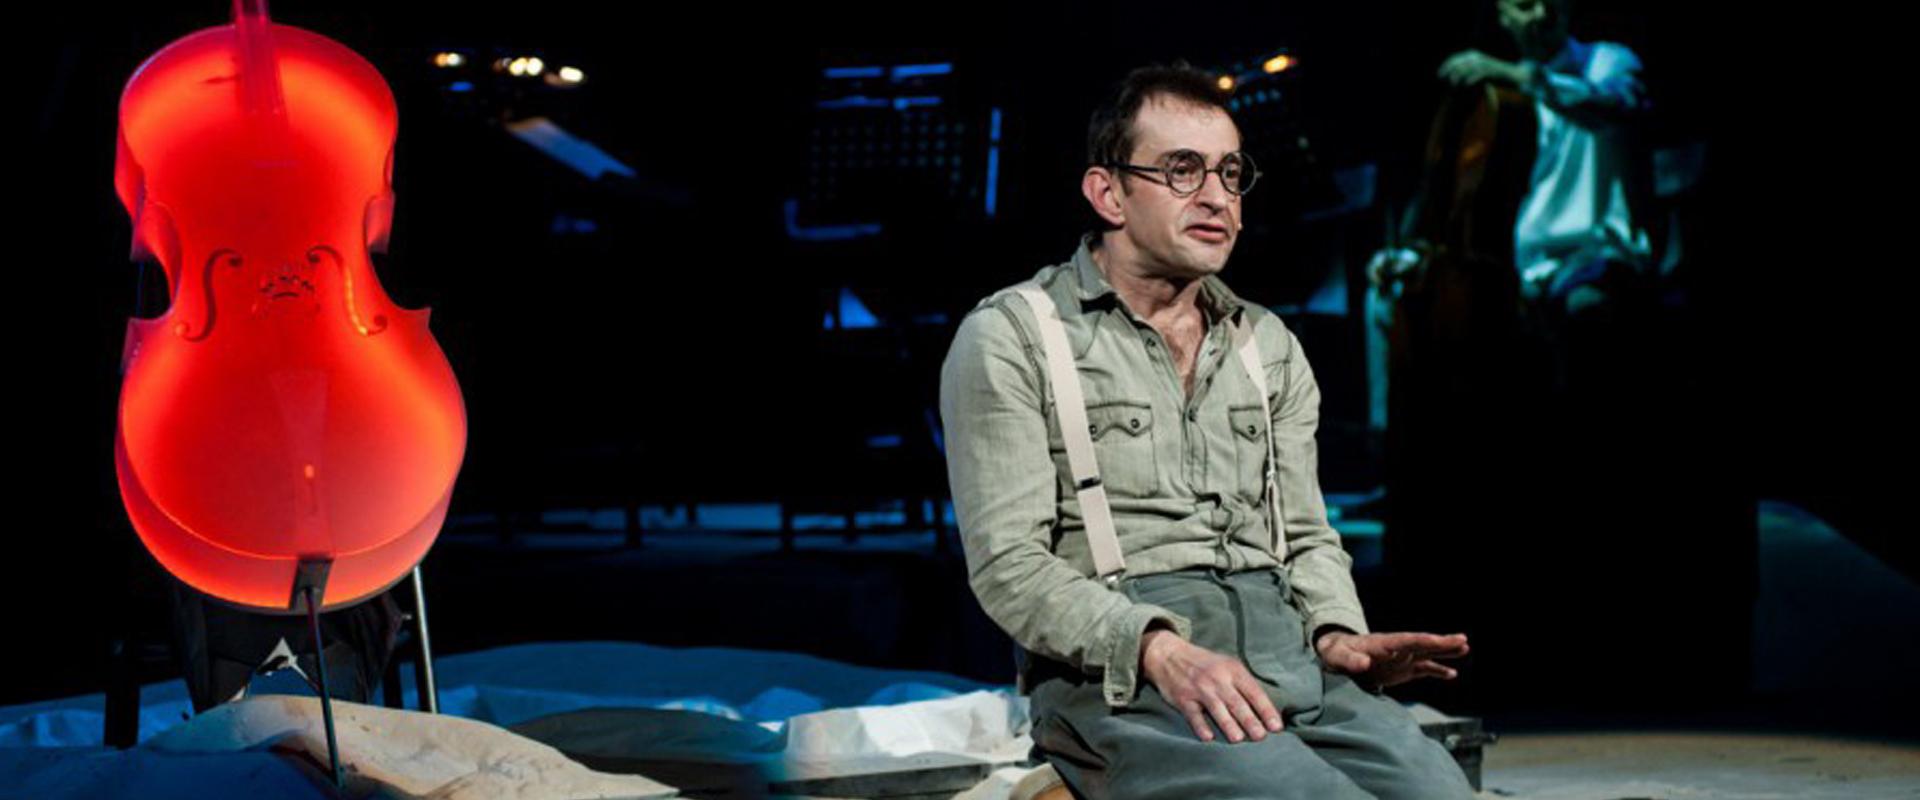 Konstantin Khabenskiy in Don't Leave Your Planet